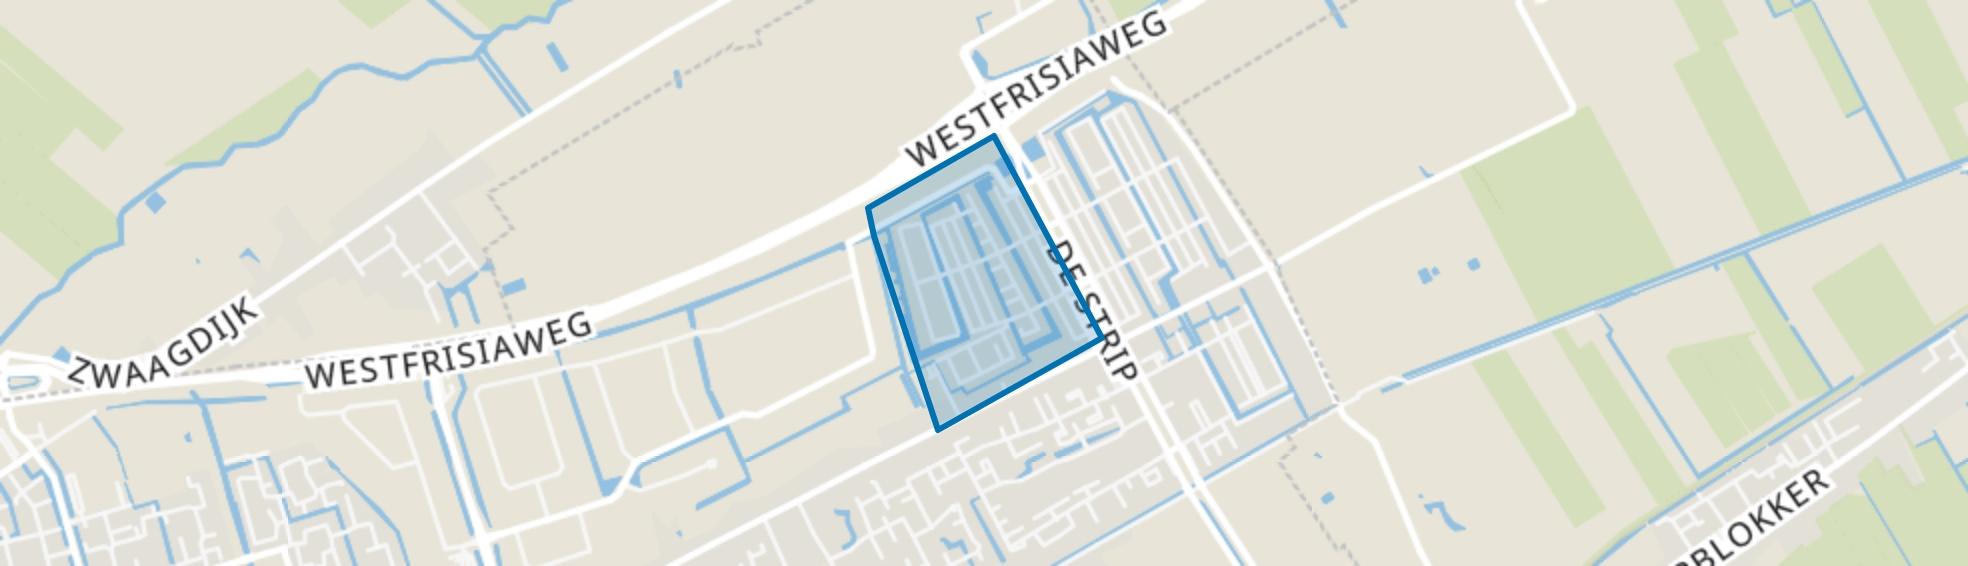 Bangert en Oosterpolder - Buurt 35 01, Zwaag map